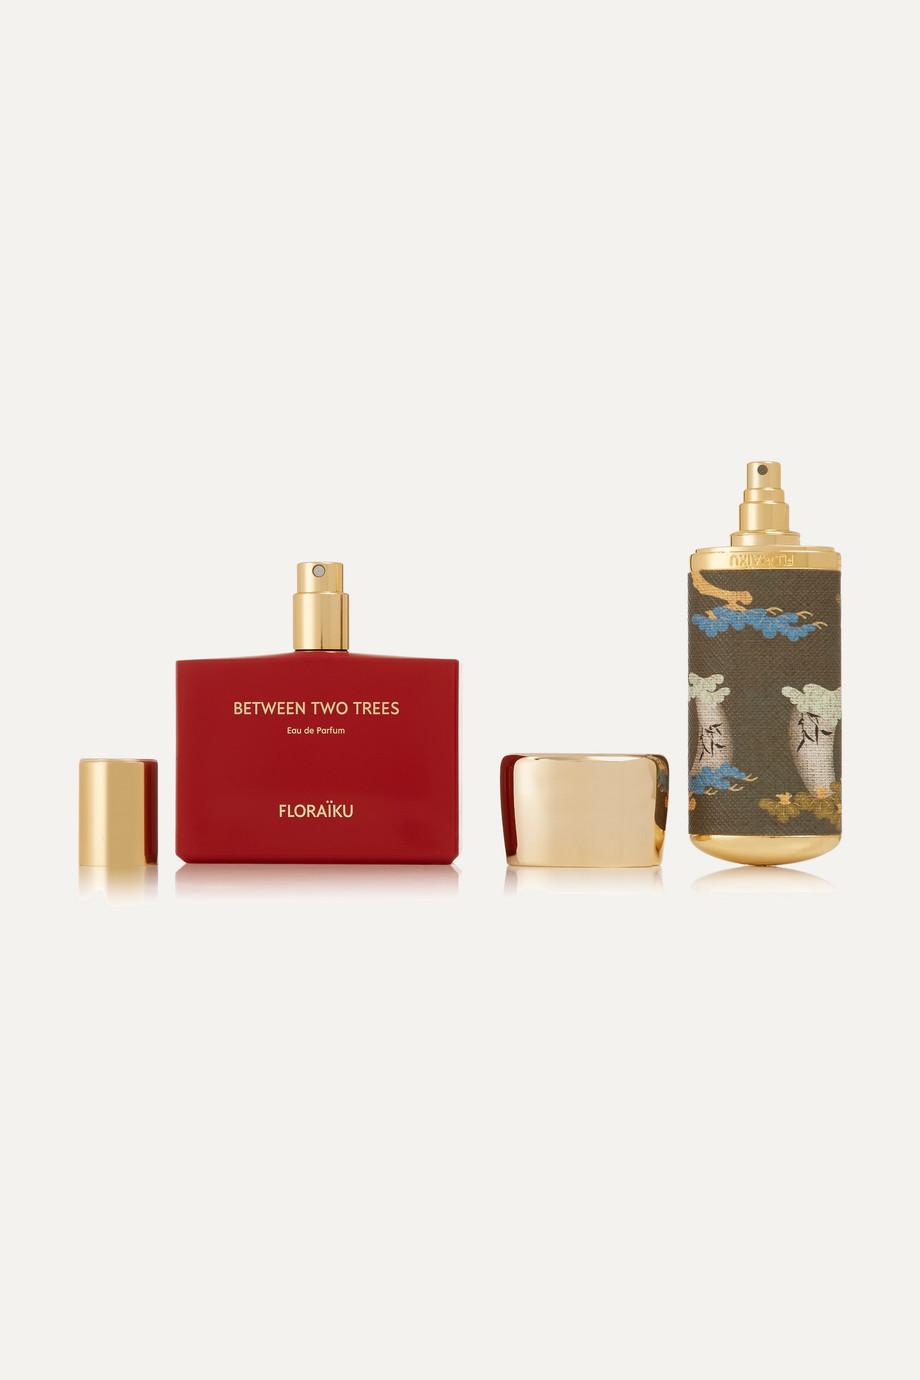 Floraiku Between Two Trees Eau de Parfum Set